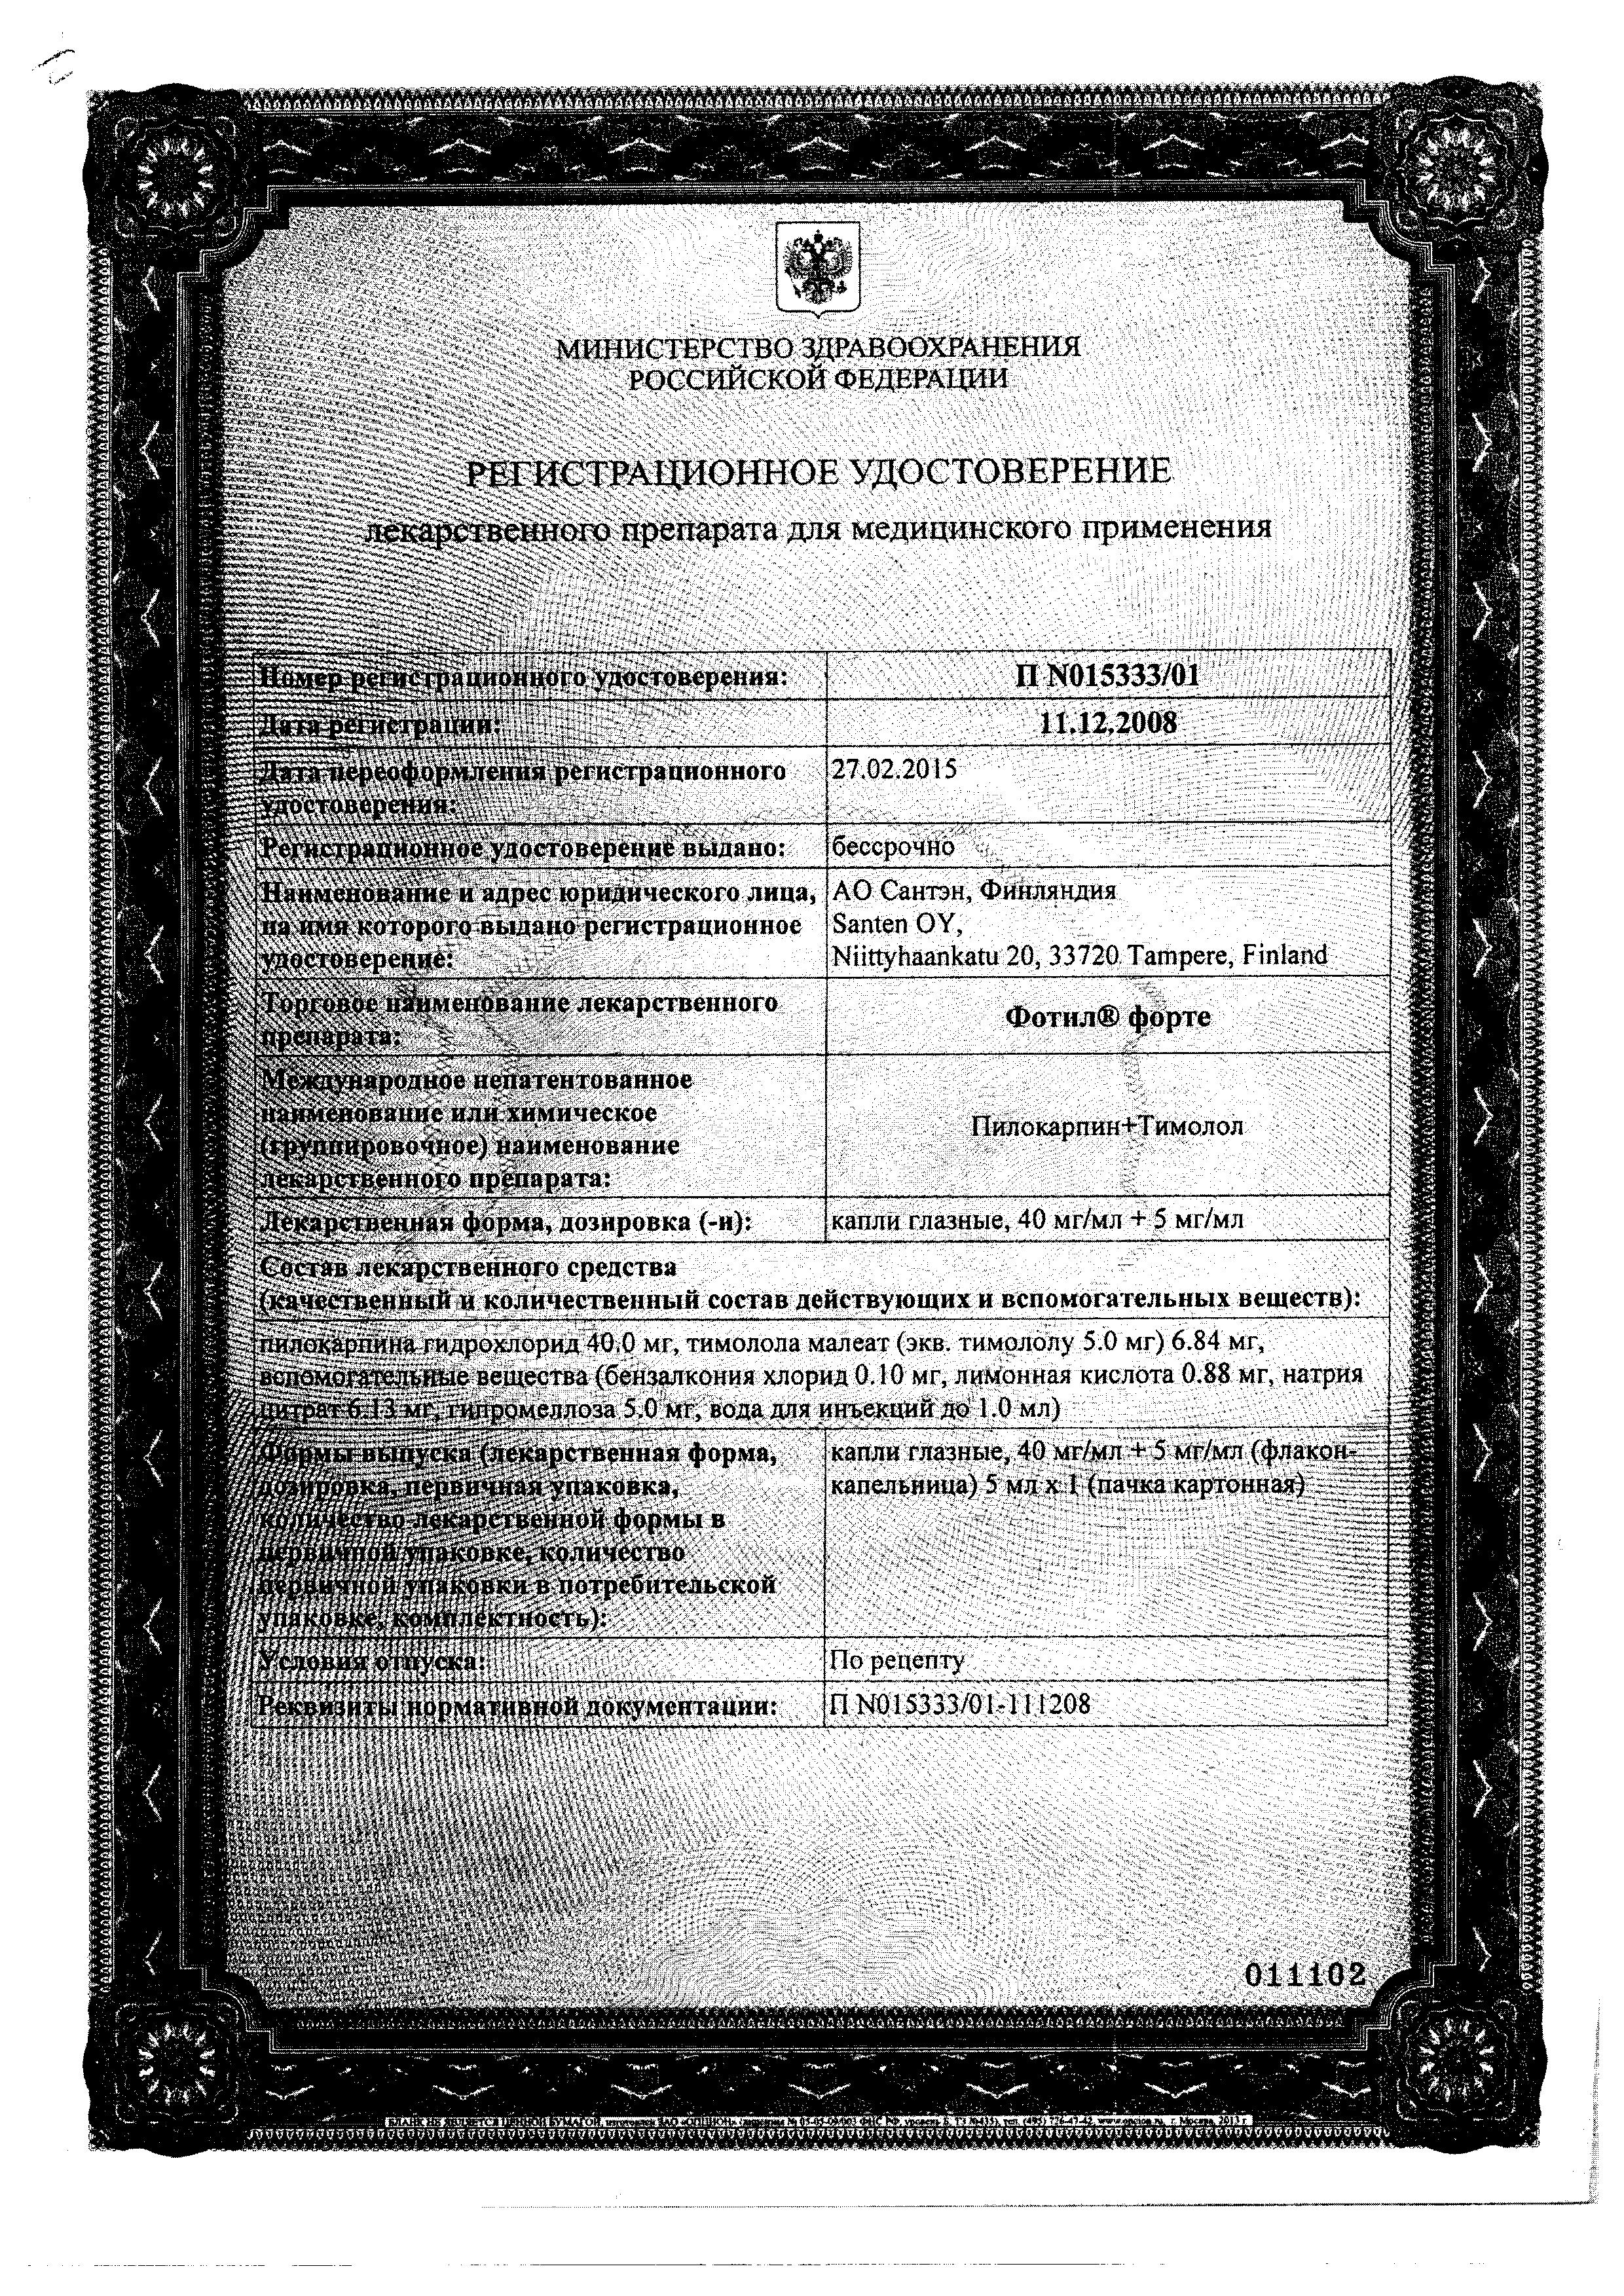 Фотил форте сертификат